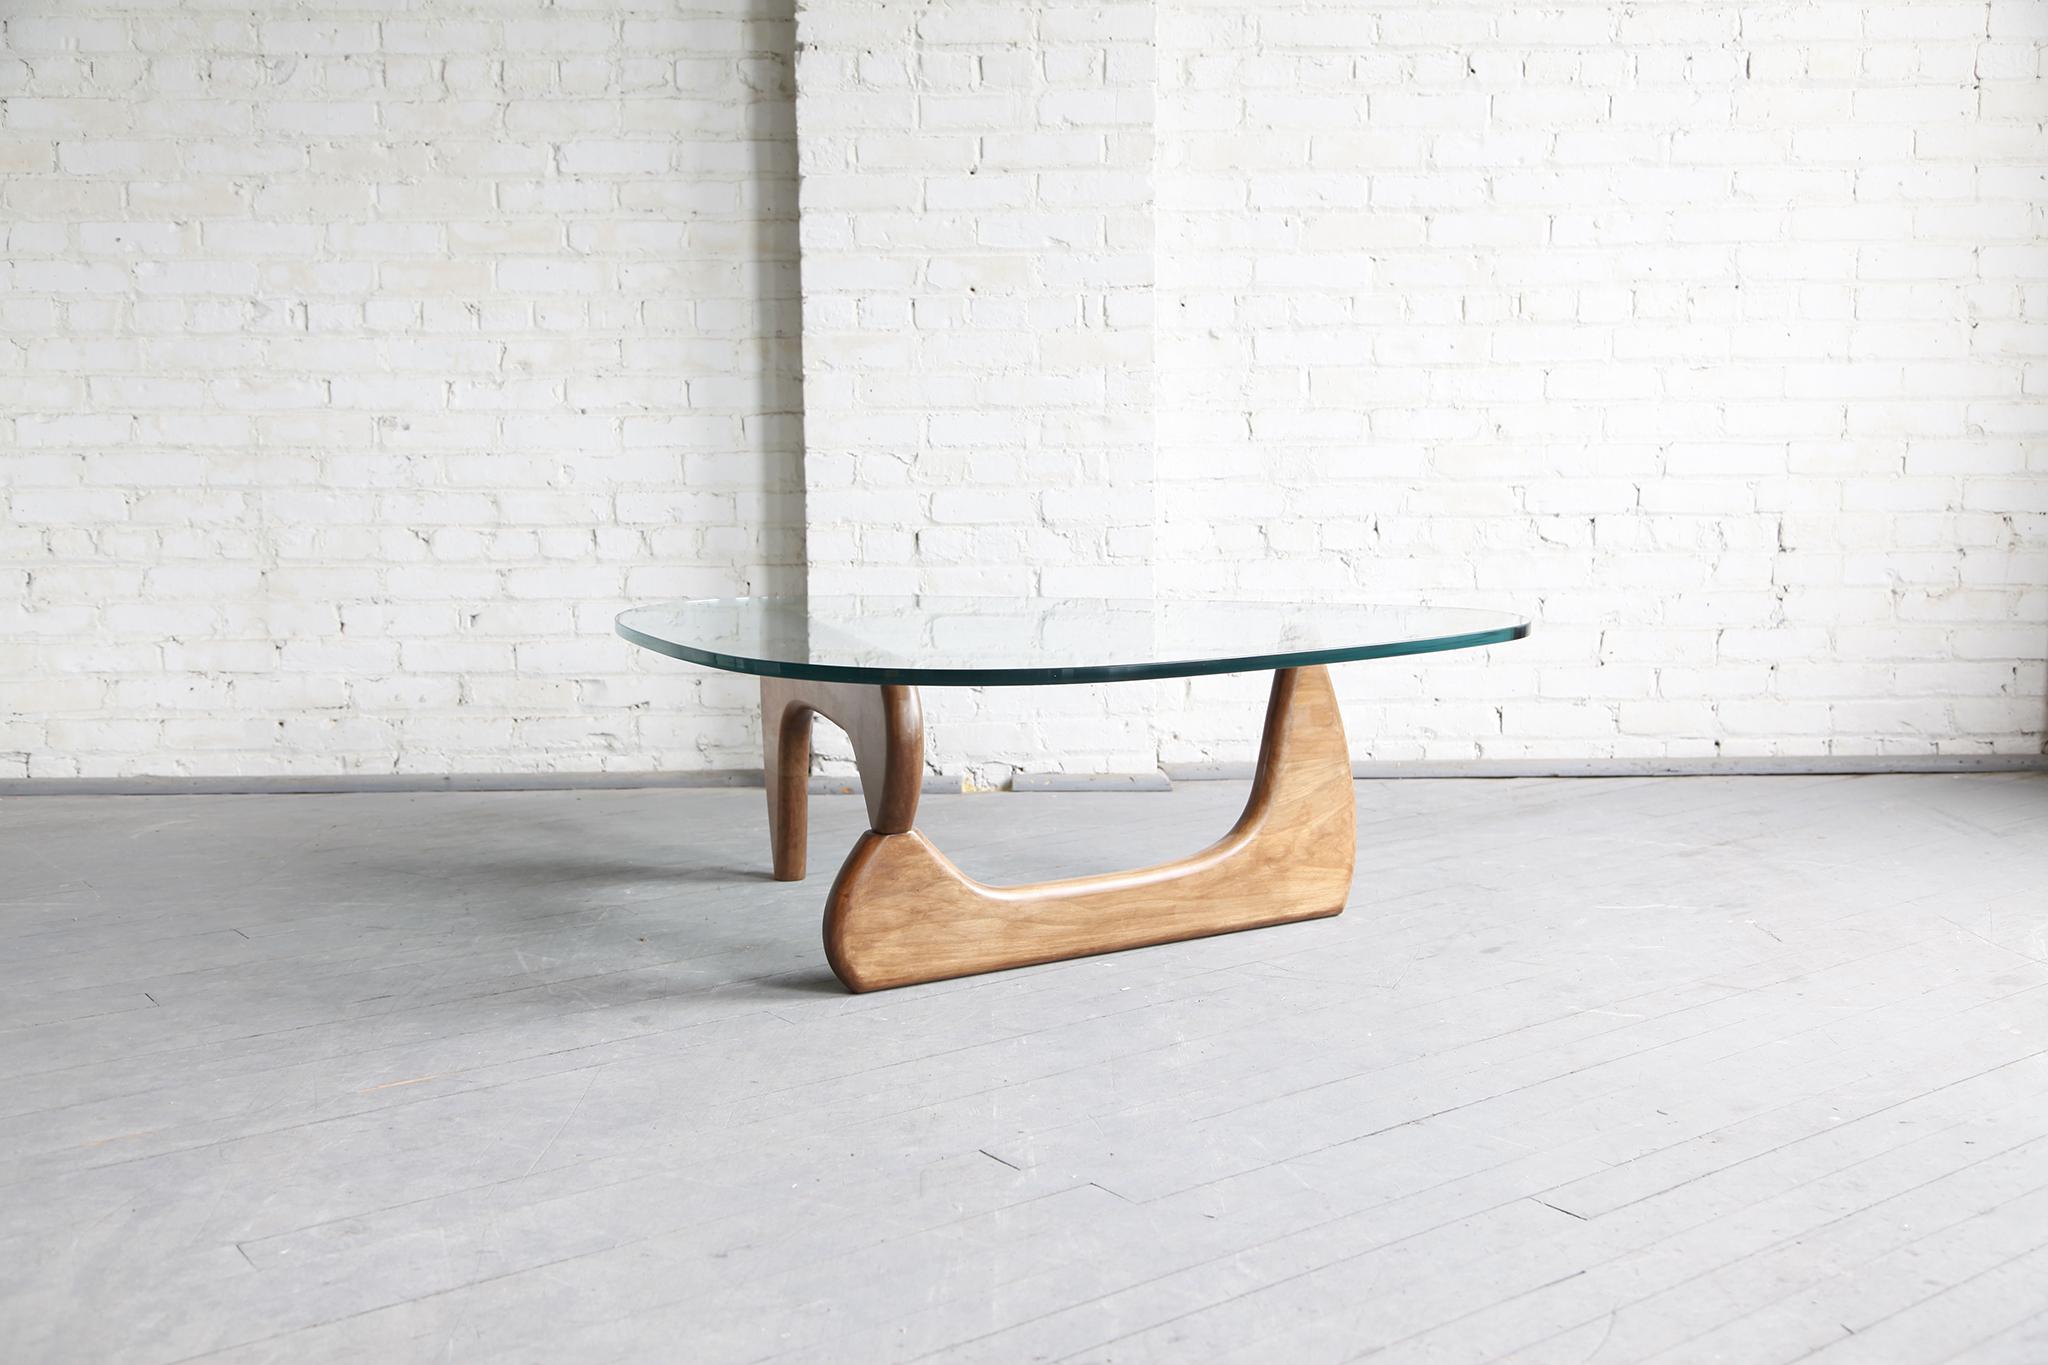 Midcentury modern Isamu Noguchi style coffee table – MCMBKNY